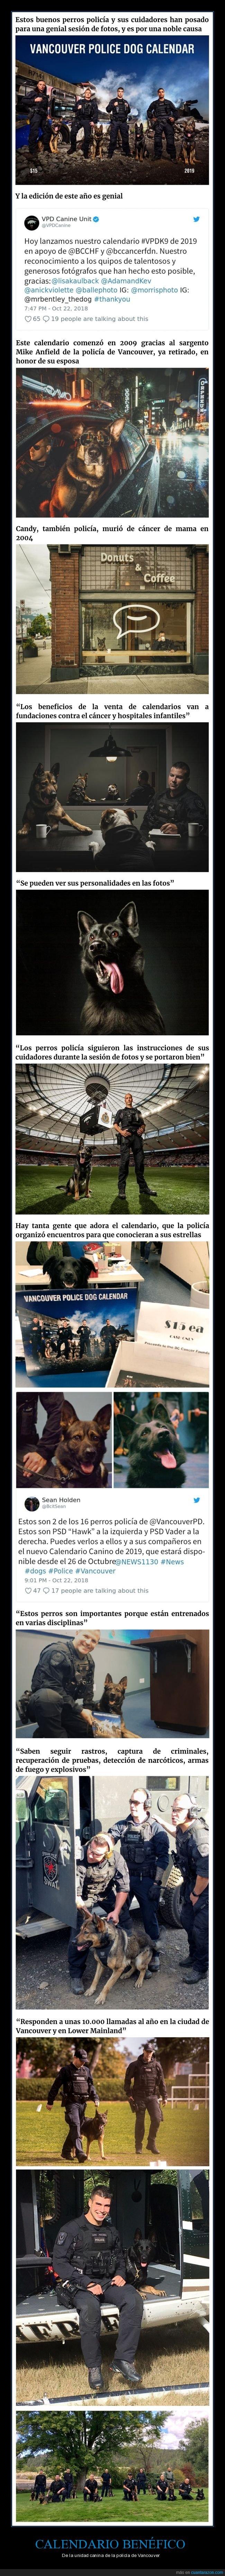 calendario benéfico,policía,unidad canina,vancouver